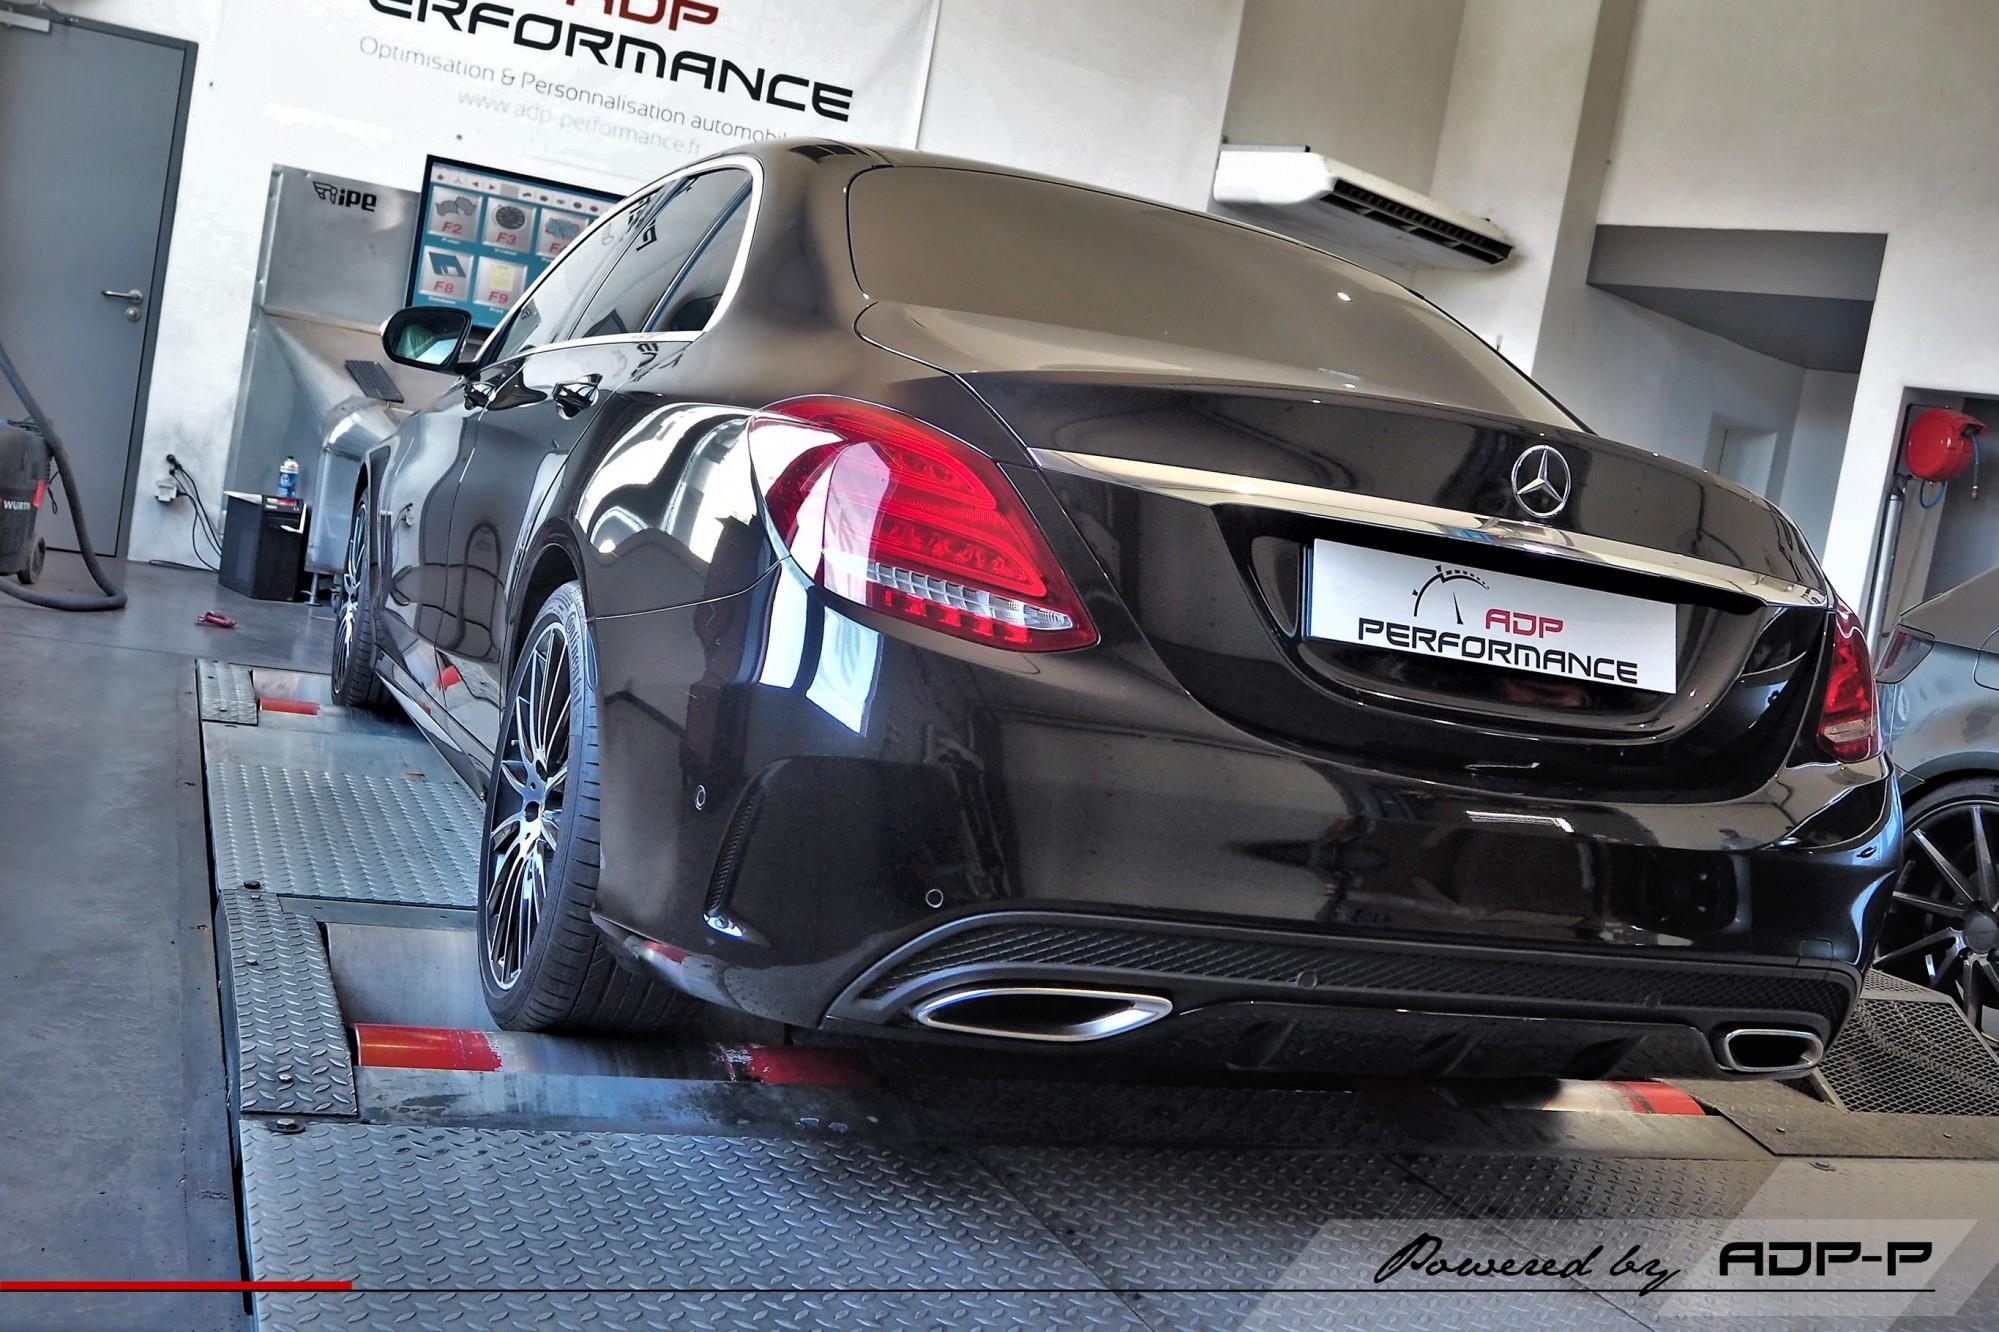 Reprogrammation moteur Arles, St Rémy de Provence - Mercedes C 200 (W205) 184cv - ADP Performance